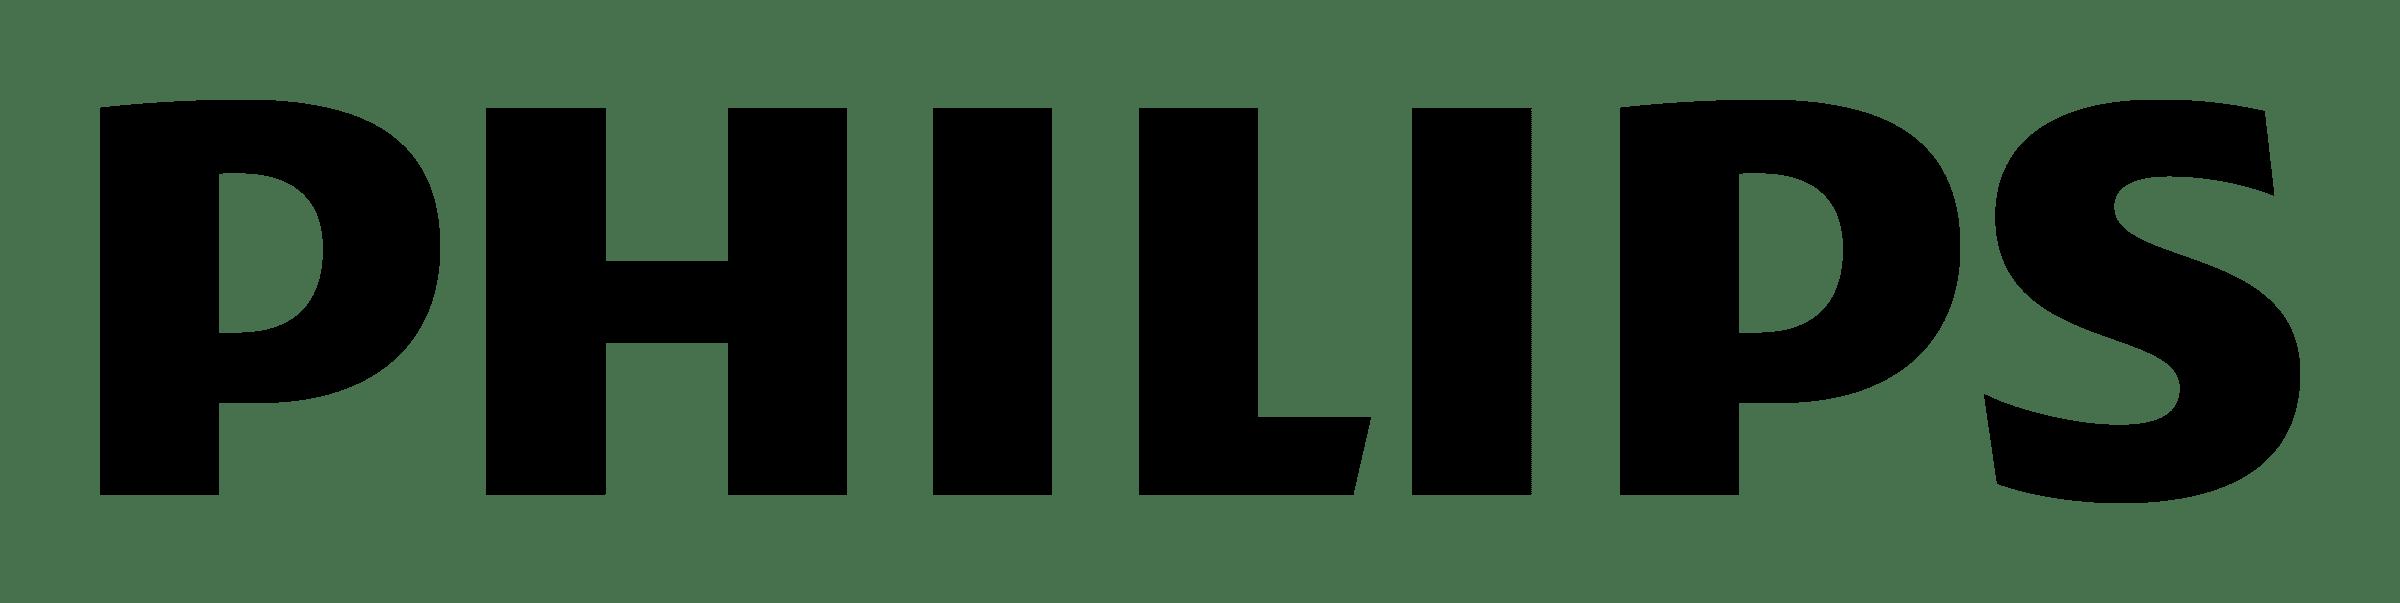 philips-logo-black-and-white